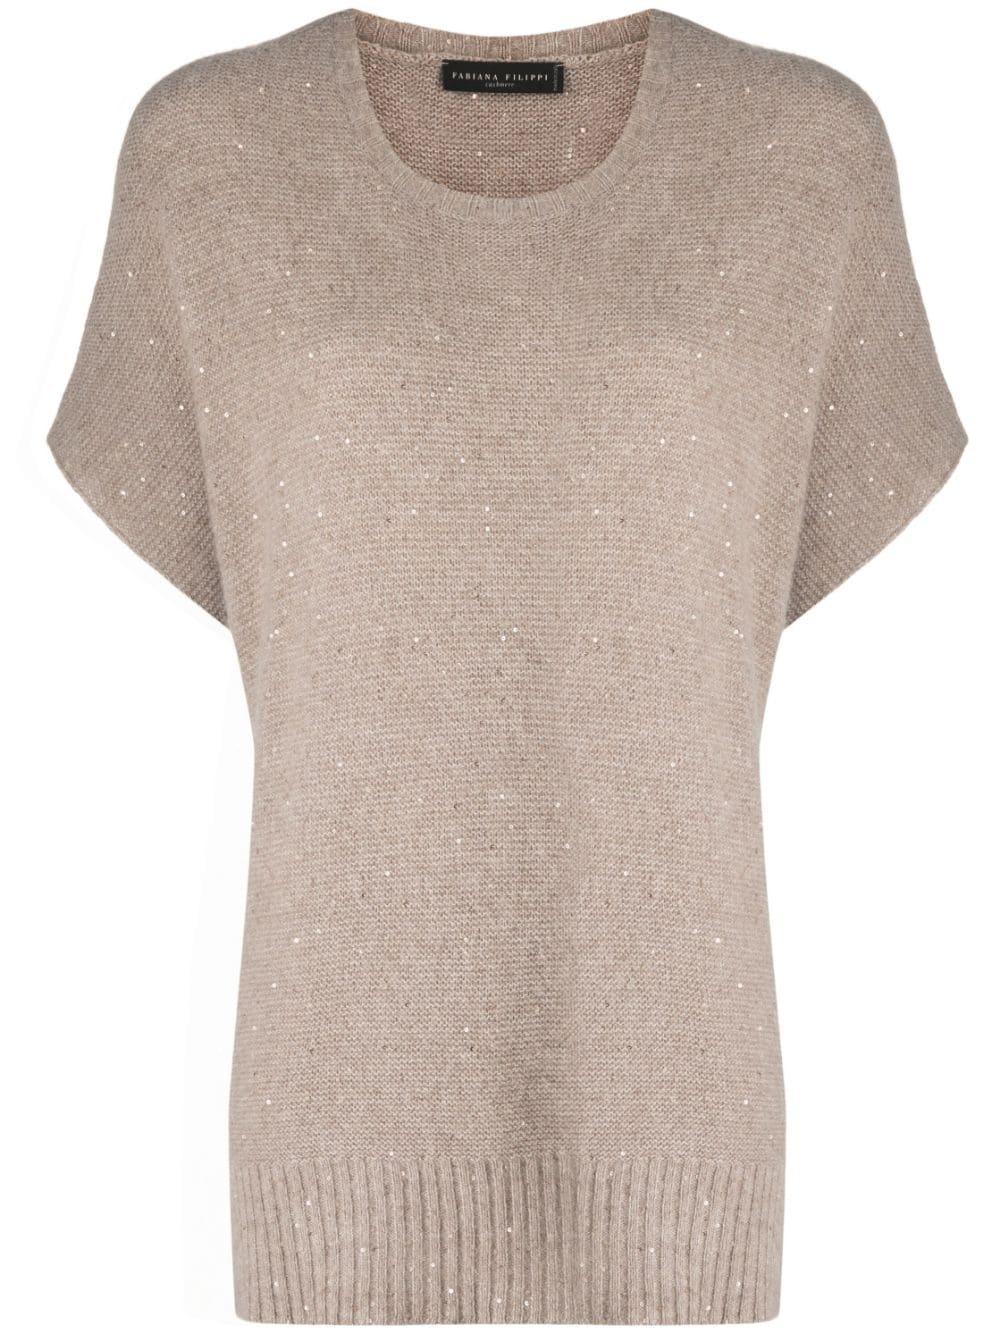 Sequin Knit Sweater Item # MAD221B695